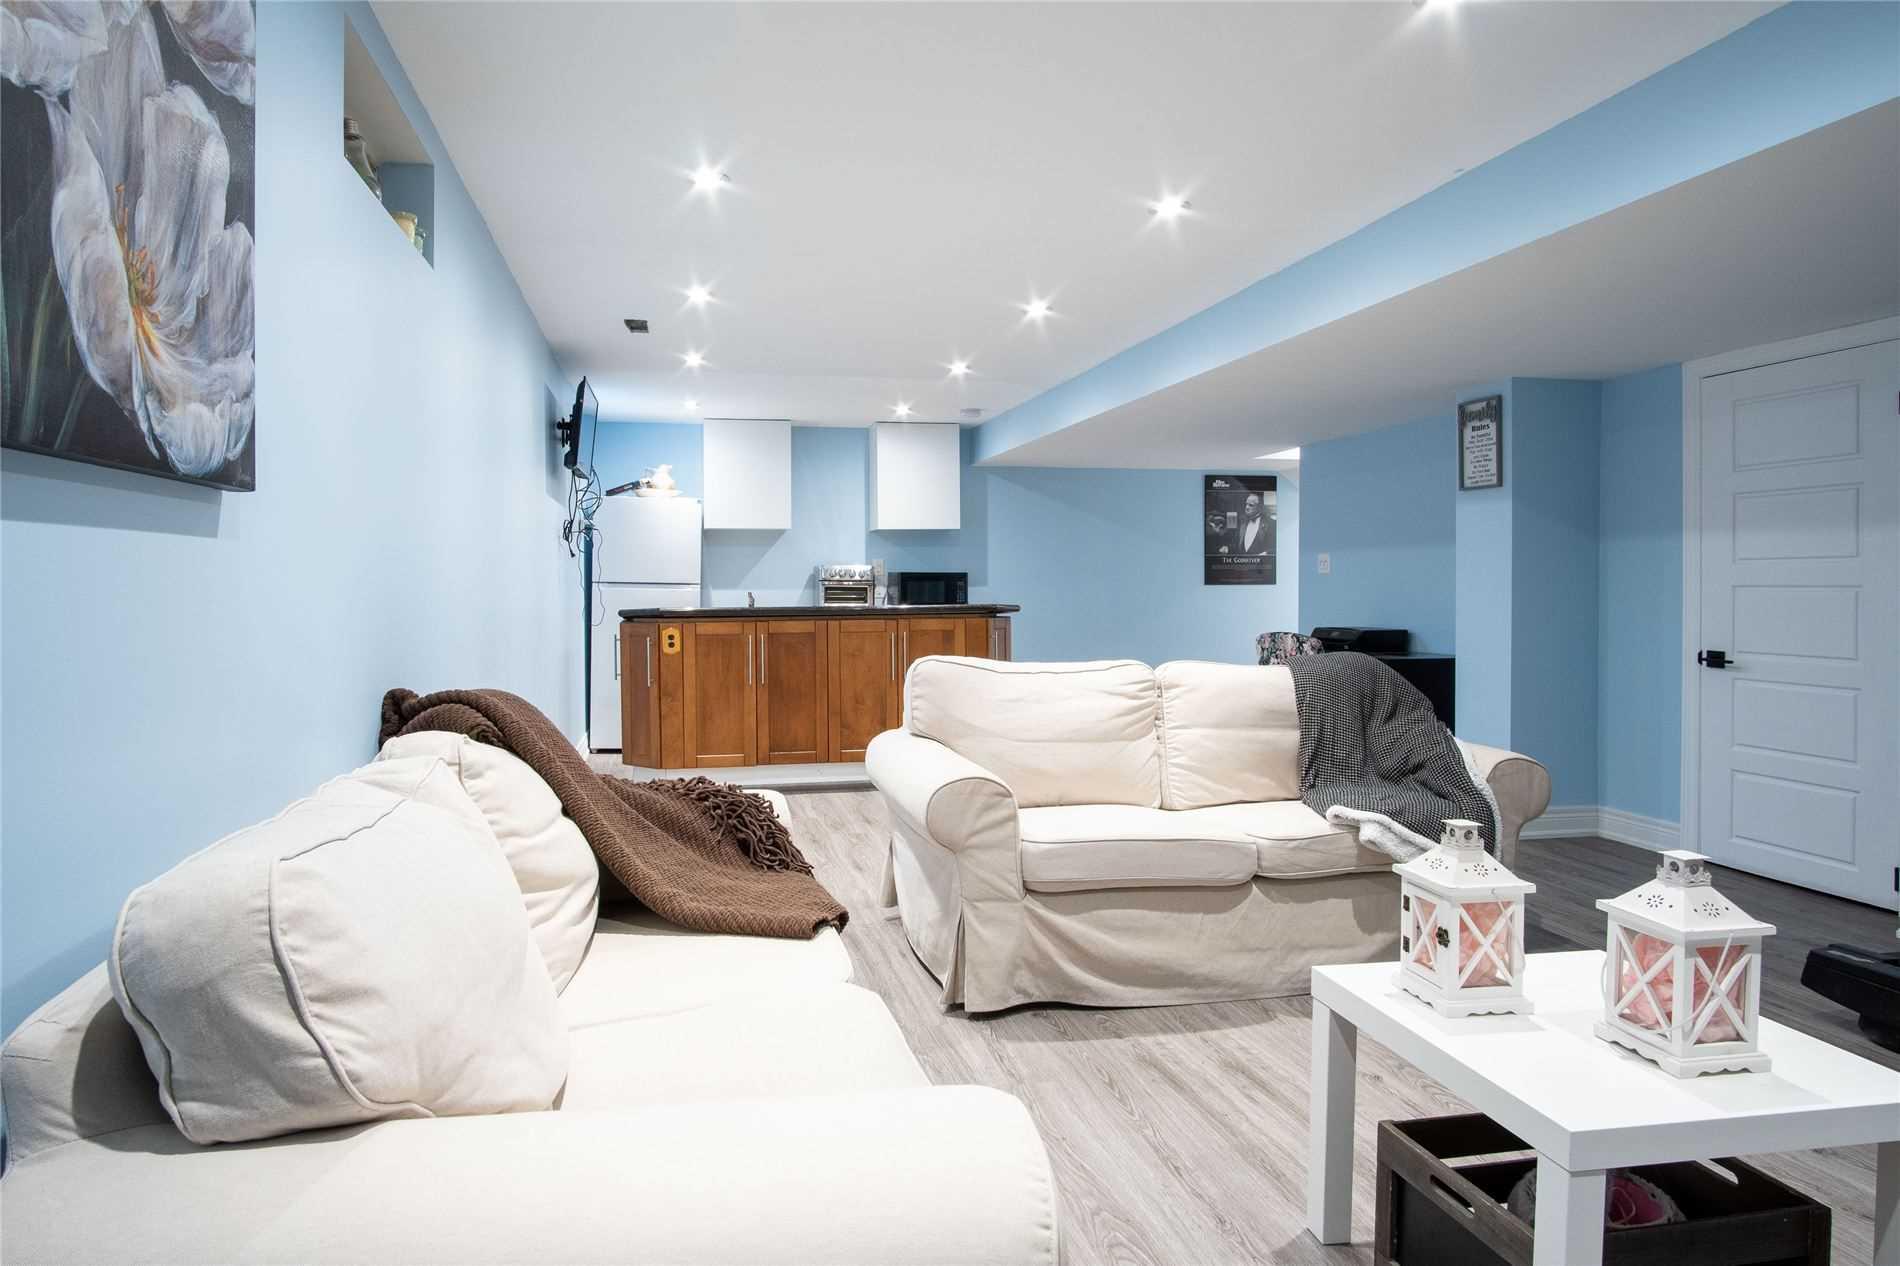 827 Biggar Hts - Coates Detached for sale, 4 Bedrooms (W5400280) - #27